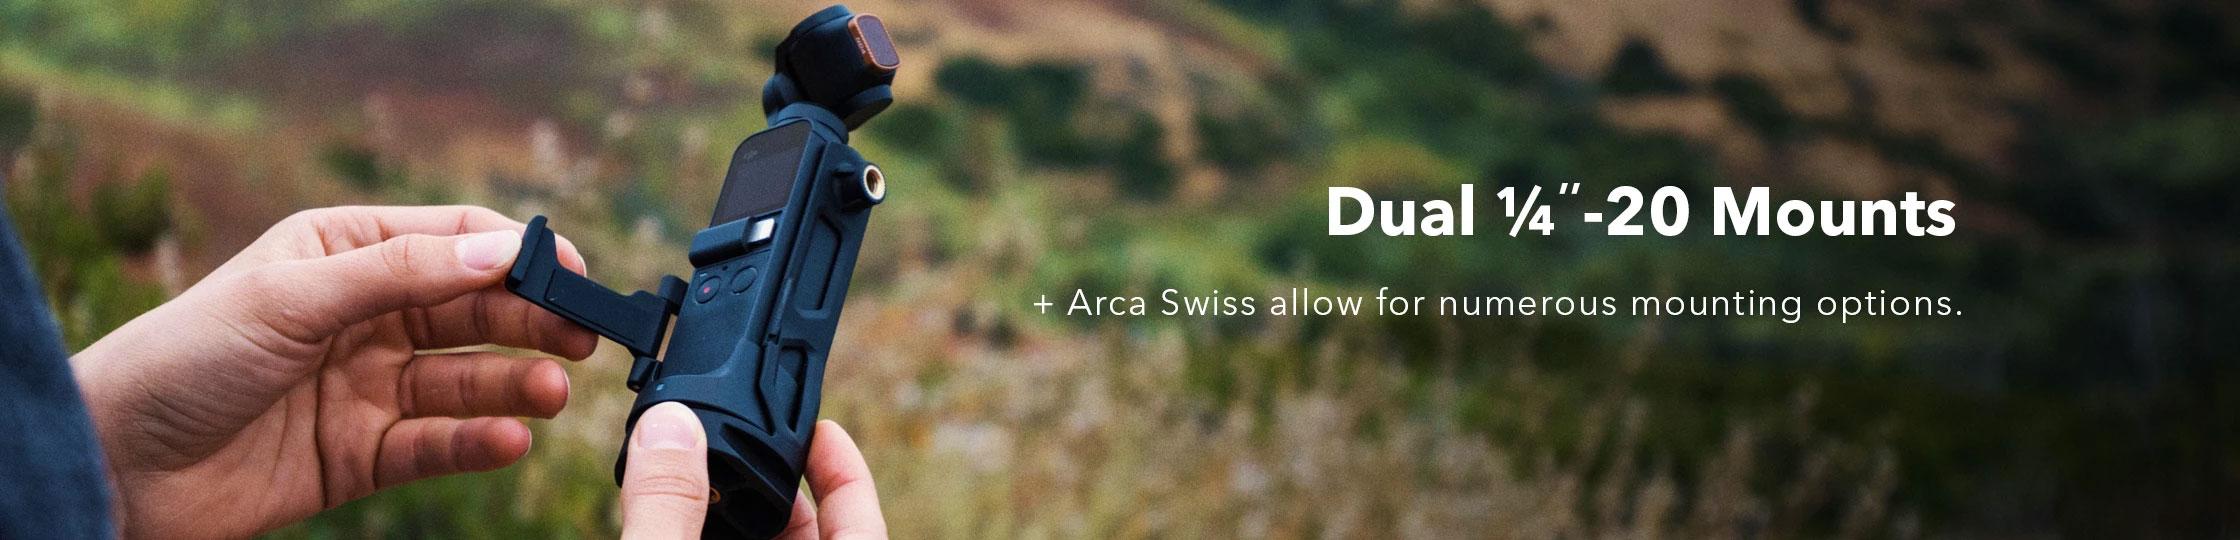 PolarPro Wifi Tripod Harness Arca Swiss